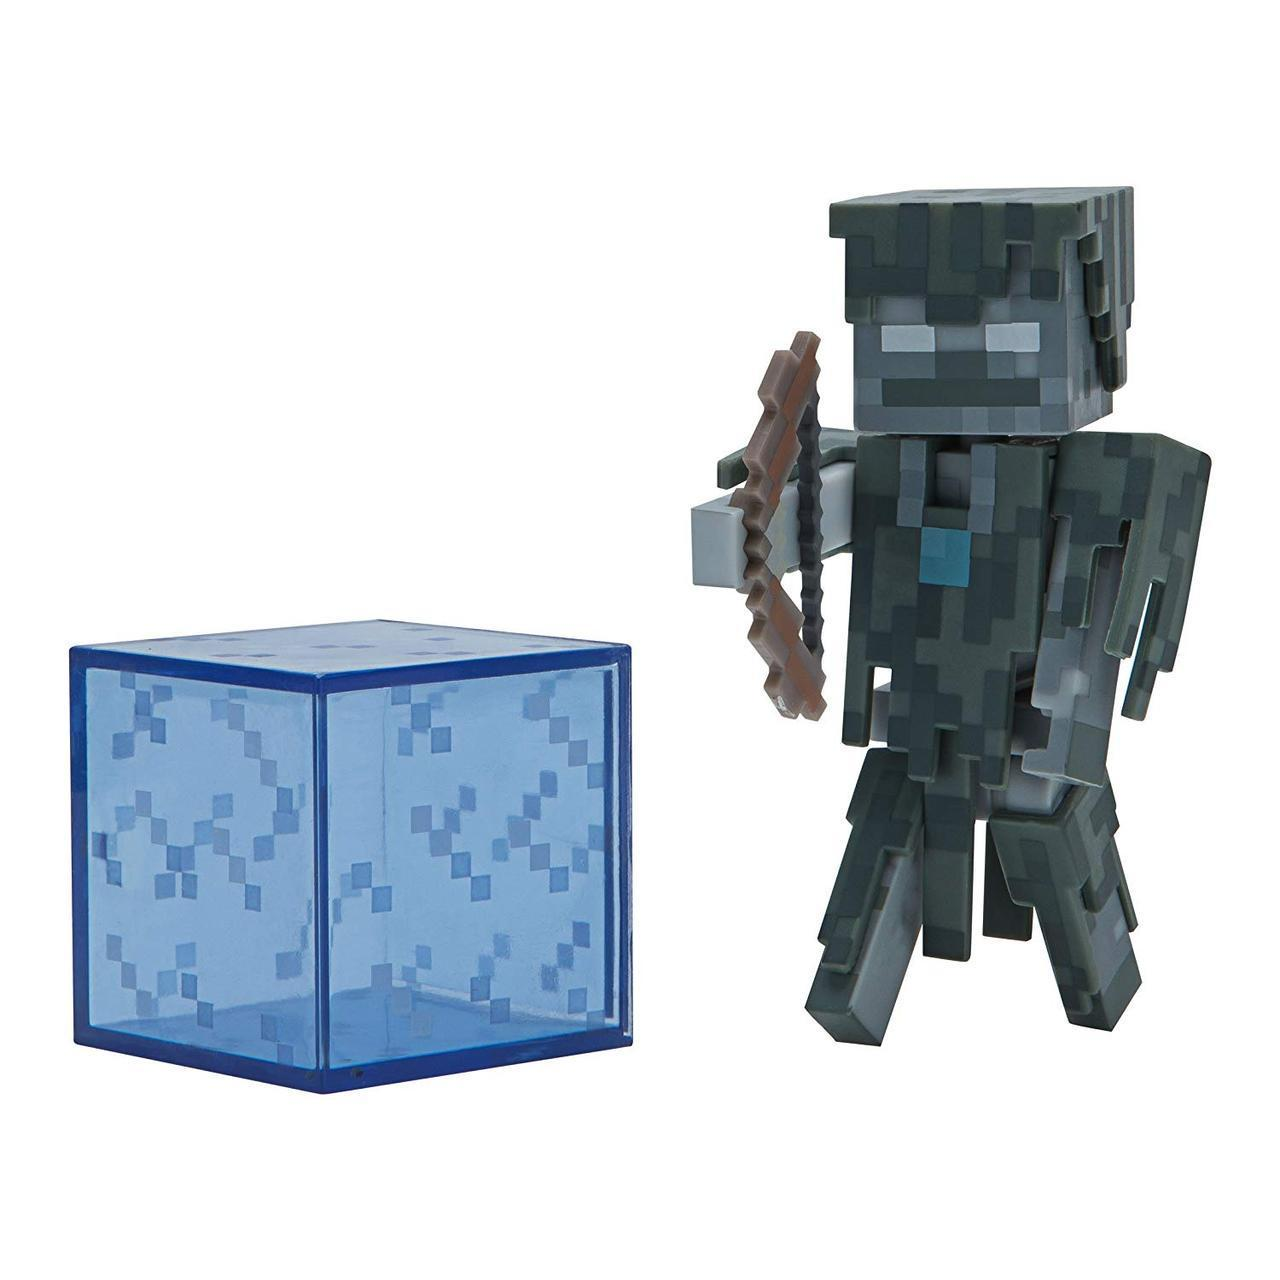 Фигурка Зимогор с блоком Стрей Майнкрафт Minecraft Stray Figure Pack оригинал Jazwares стрэй